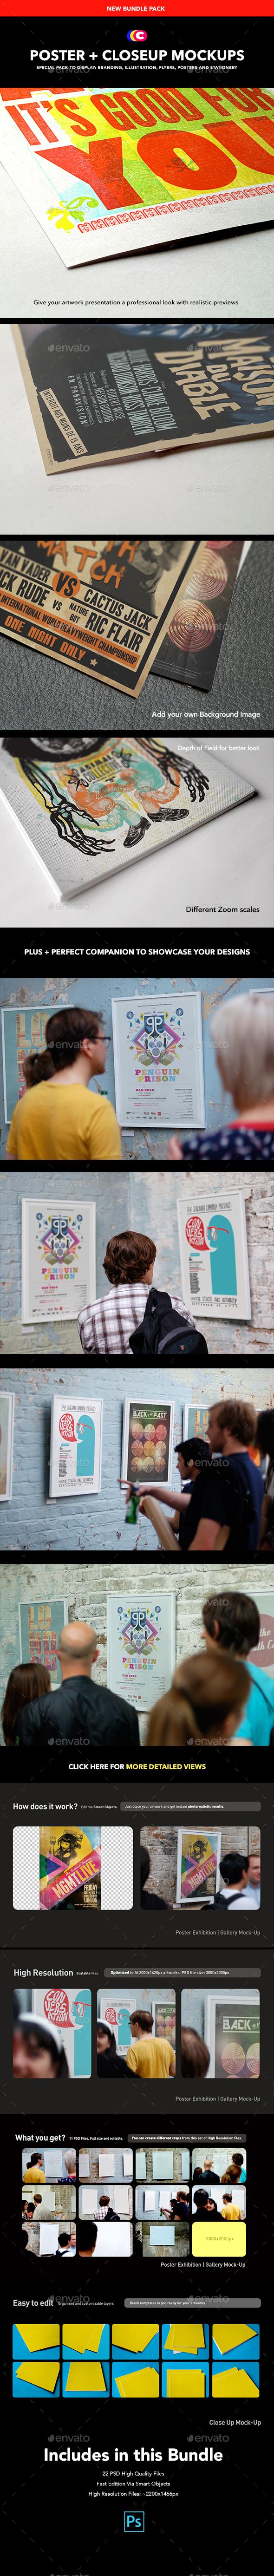 CloseUp + Poster MockUp | Detail Gallery Edition - Print Product Mock-Ups